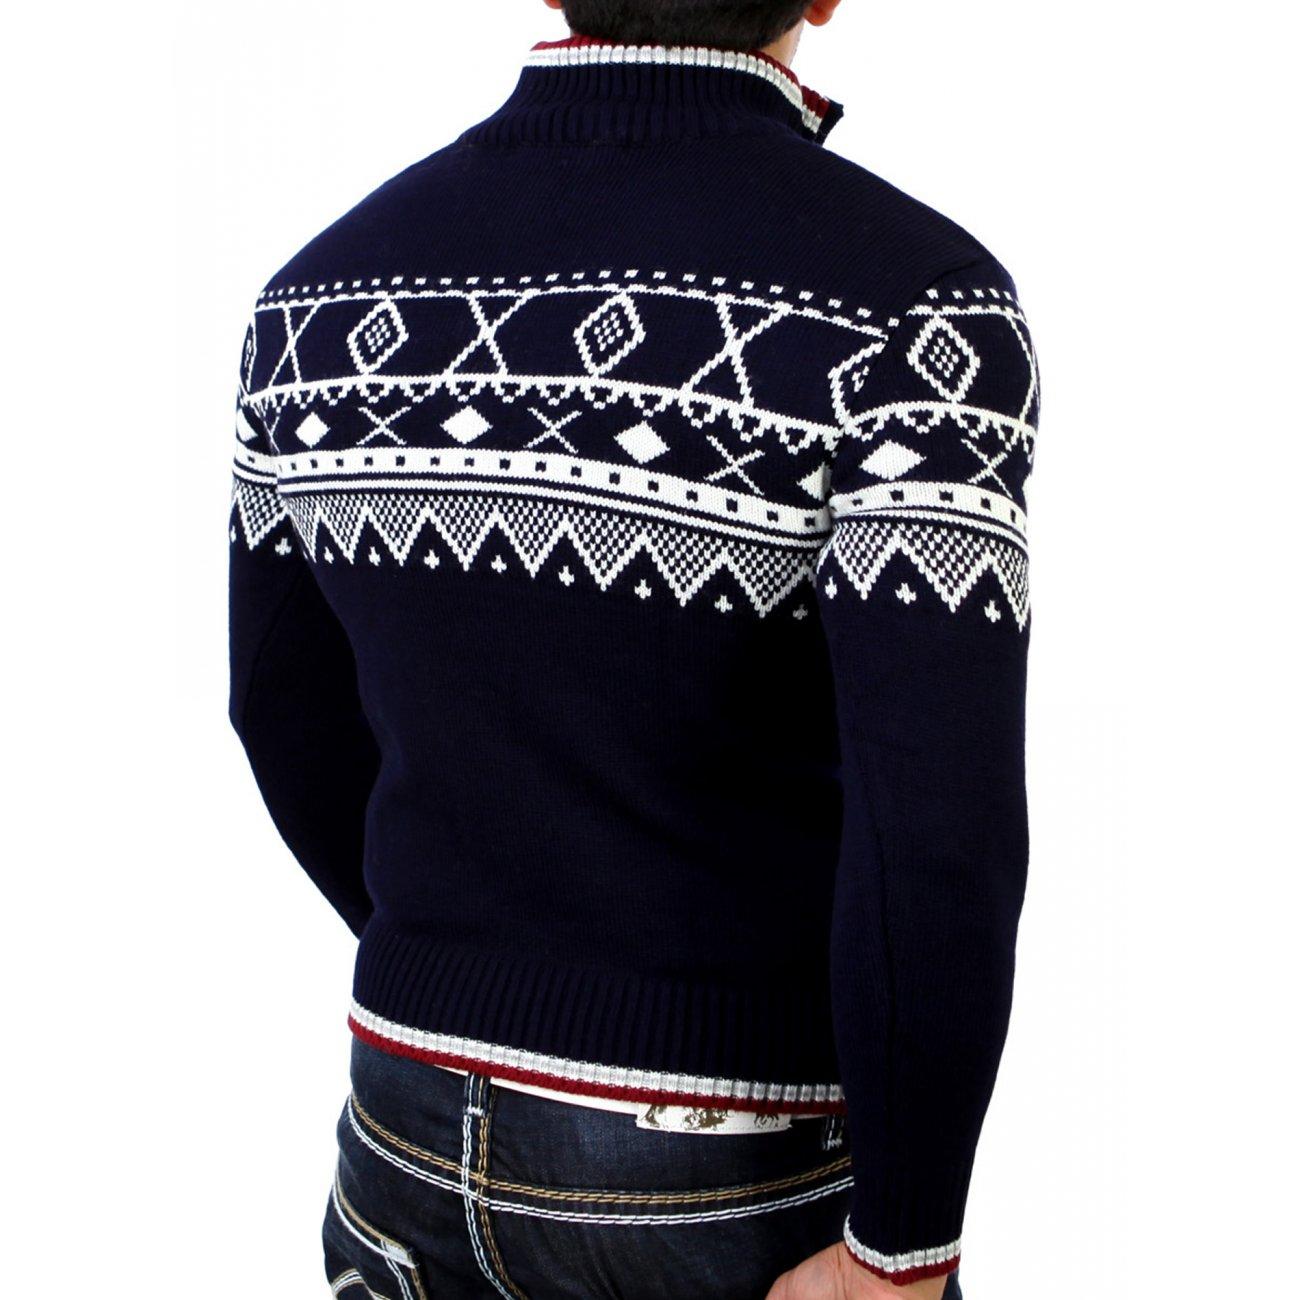 cipo baxx norweger pullover c 6343 strickpullover kaufen. Black Bedroom Furniture Sets. Home Design Ideas